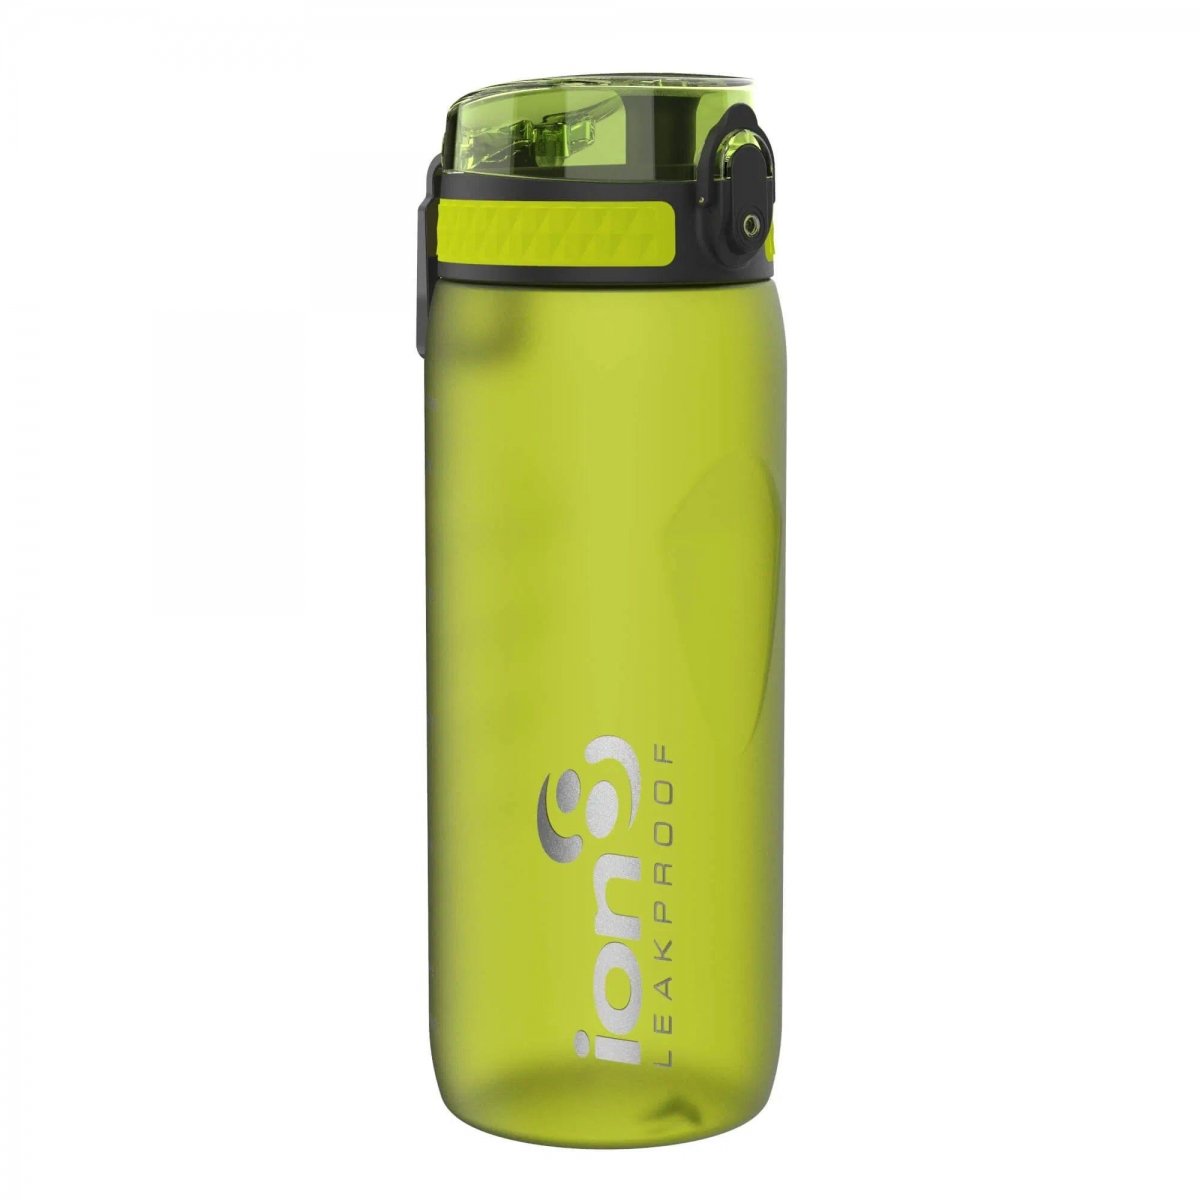 Lahev na vodu Ion8 One Touch Green, 750 ml - zelená